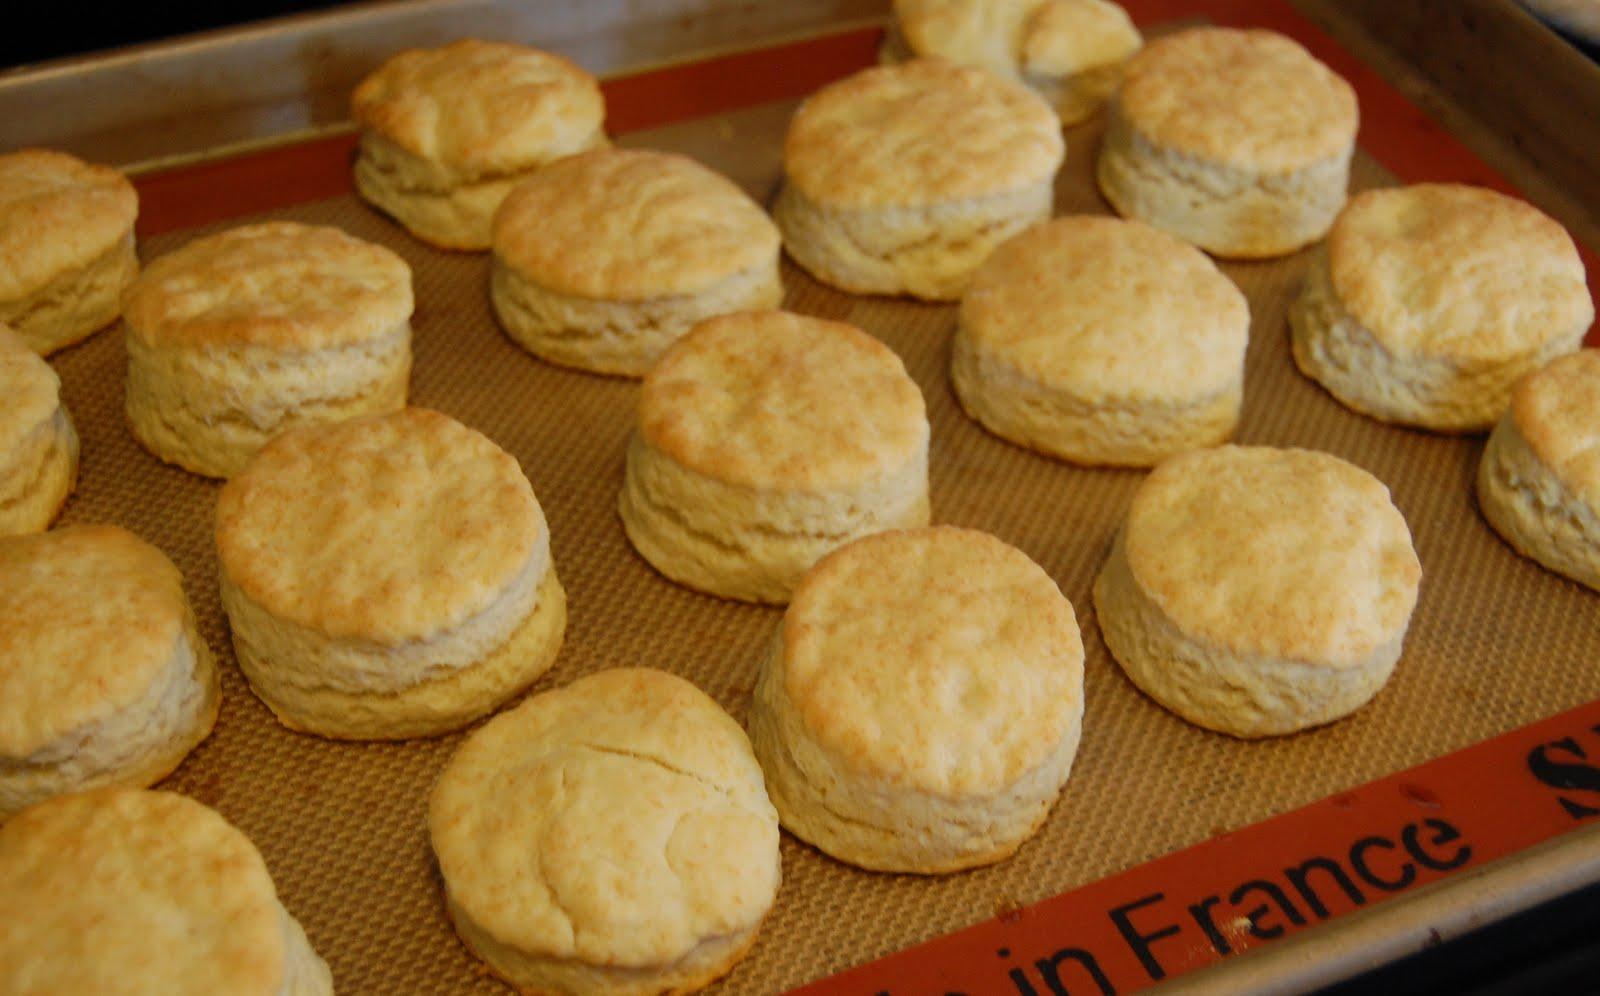 baking powder biscuits 2 c all purpose flour 1 tb baking powder 1 tsp ...